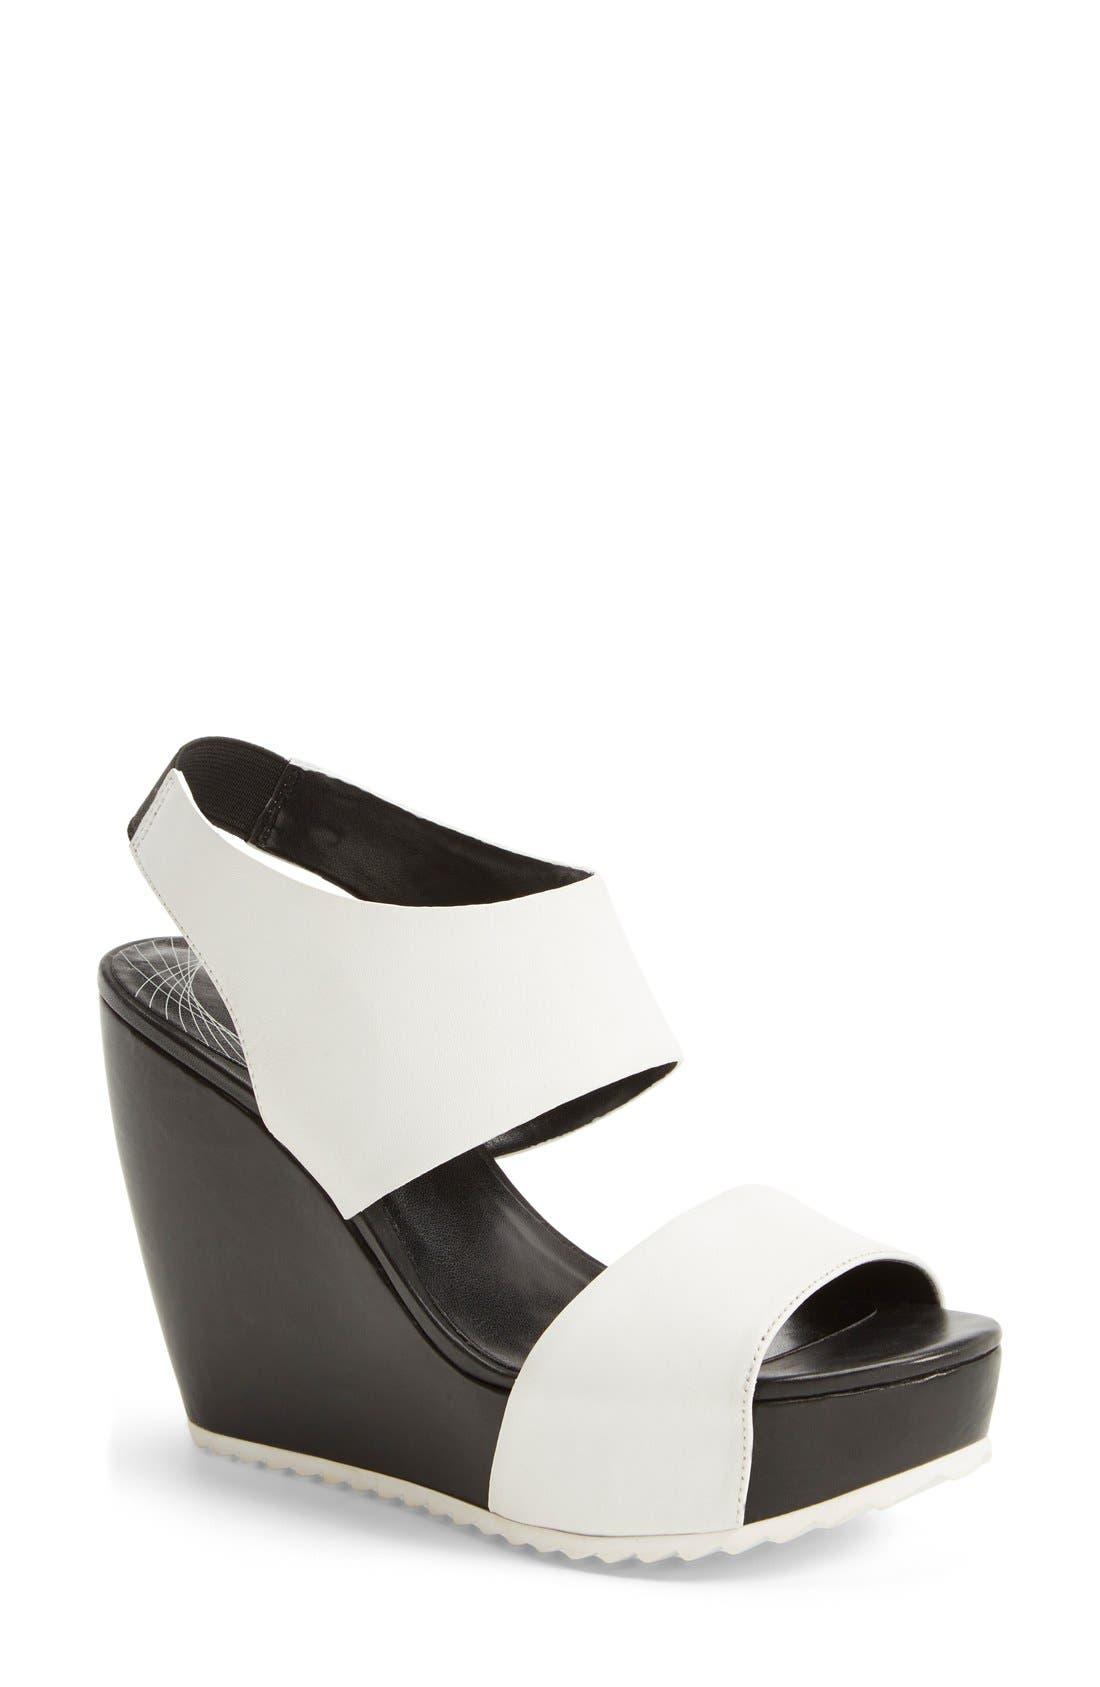 Main Image - Trouvé 'Morgan' Platform Wedge Leather Sandal (Women)